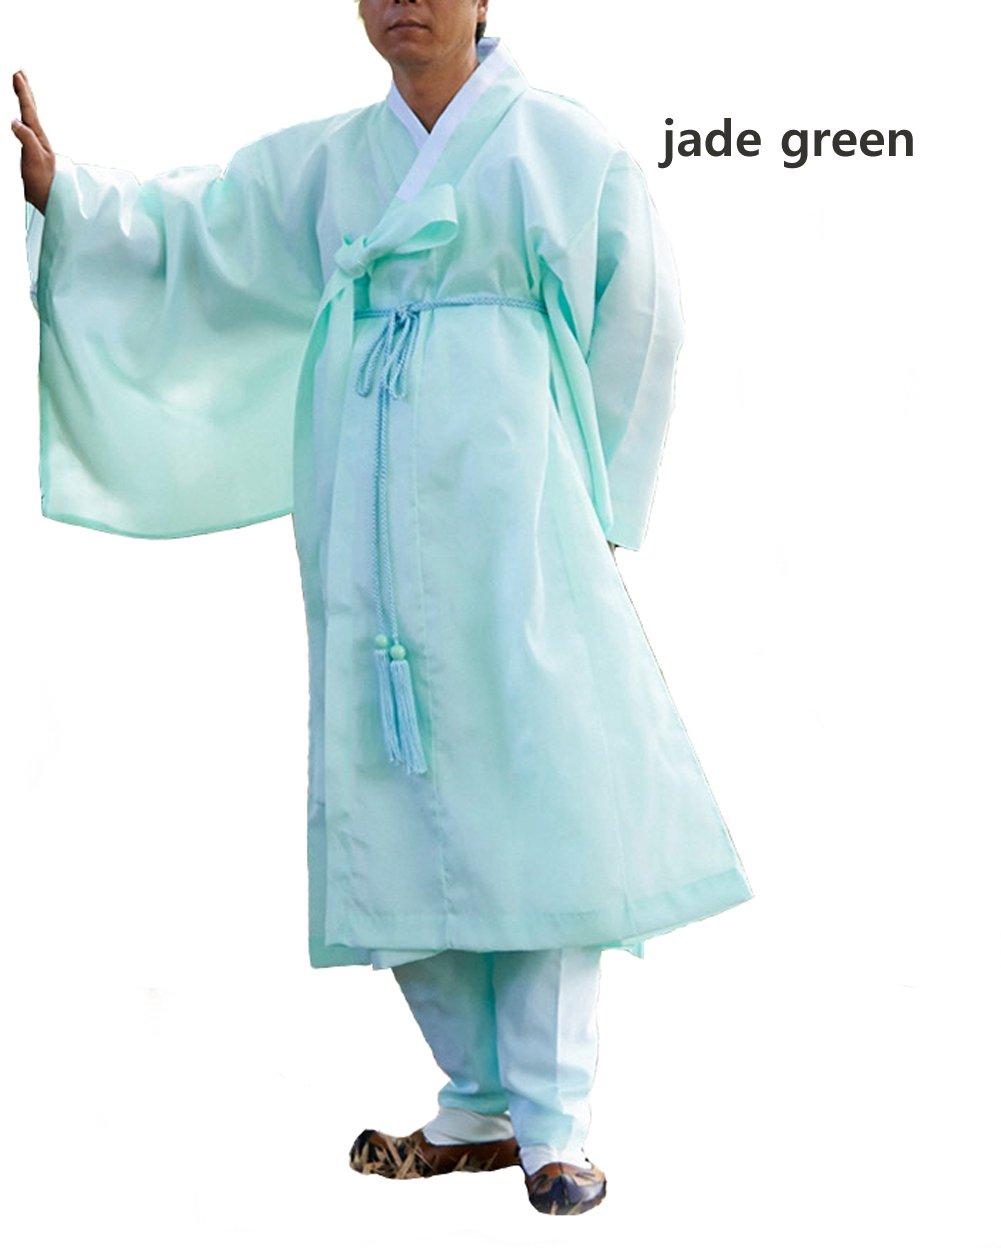 Men Water Silk Robe, Korea Traditional Men Clothing Dopo, Halloween Costumes (jade green, S) by Altair (Image #2)